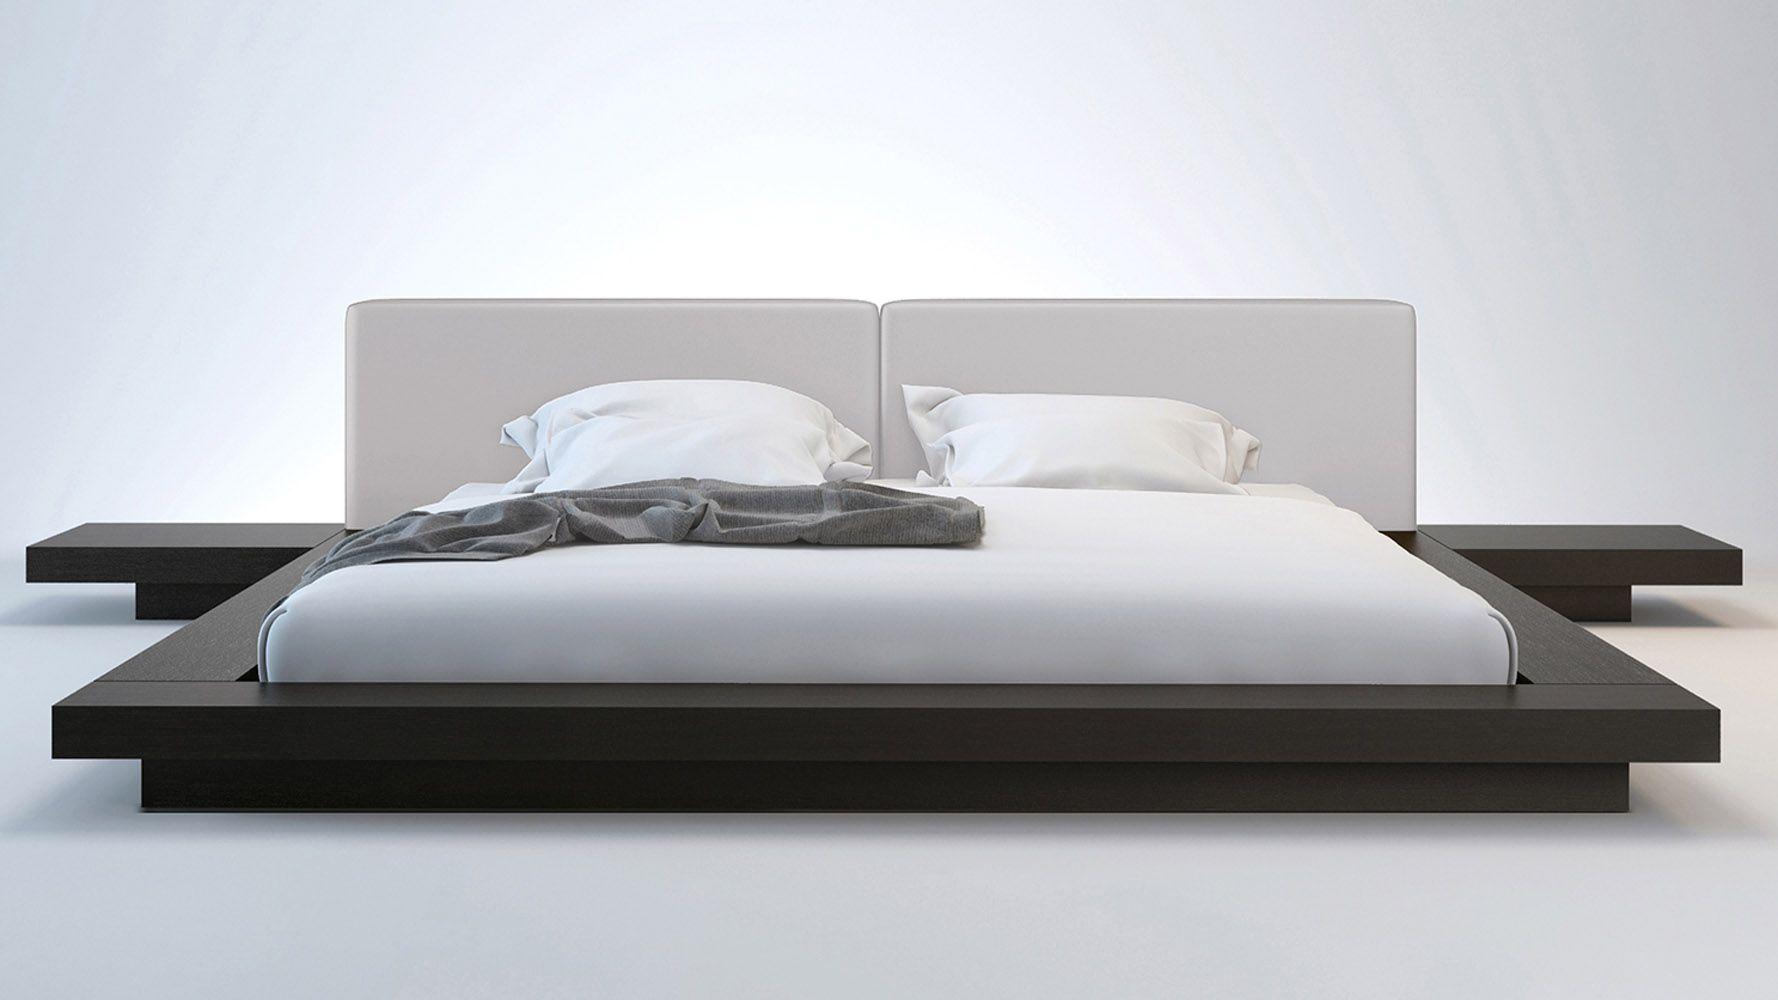 Leder Plattform Bett Rahmen Minimalistisches bett